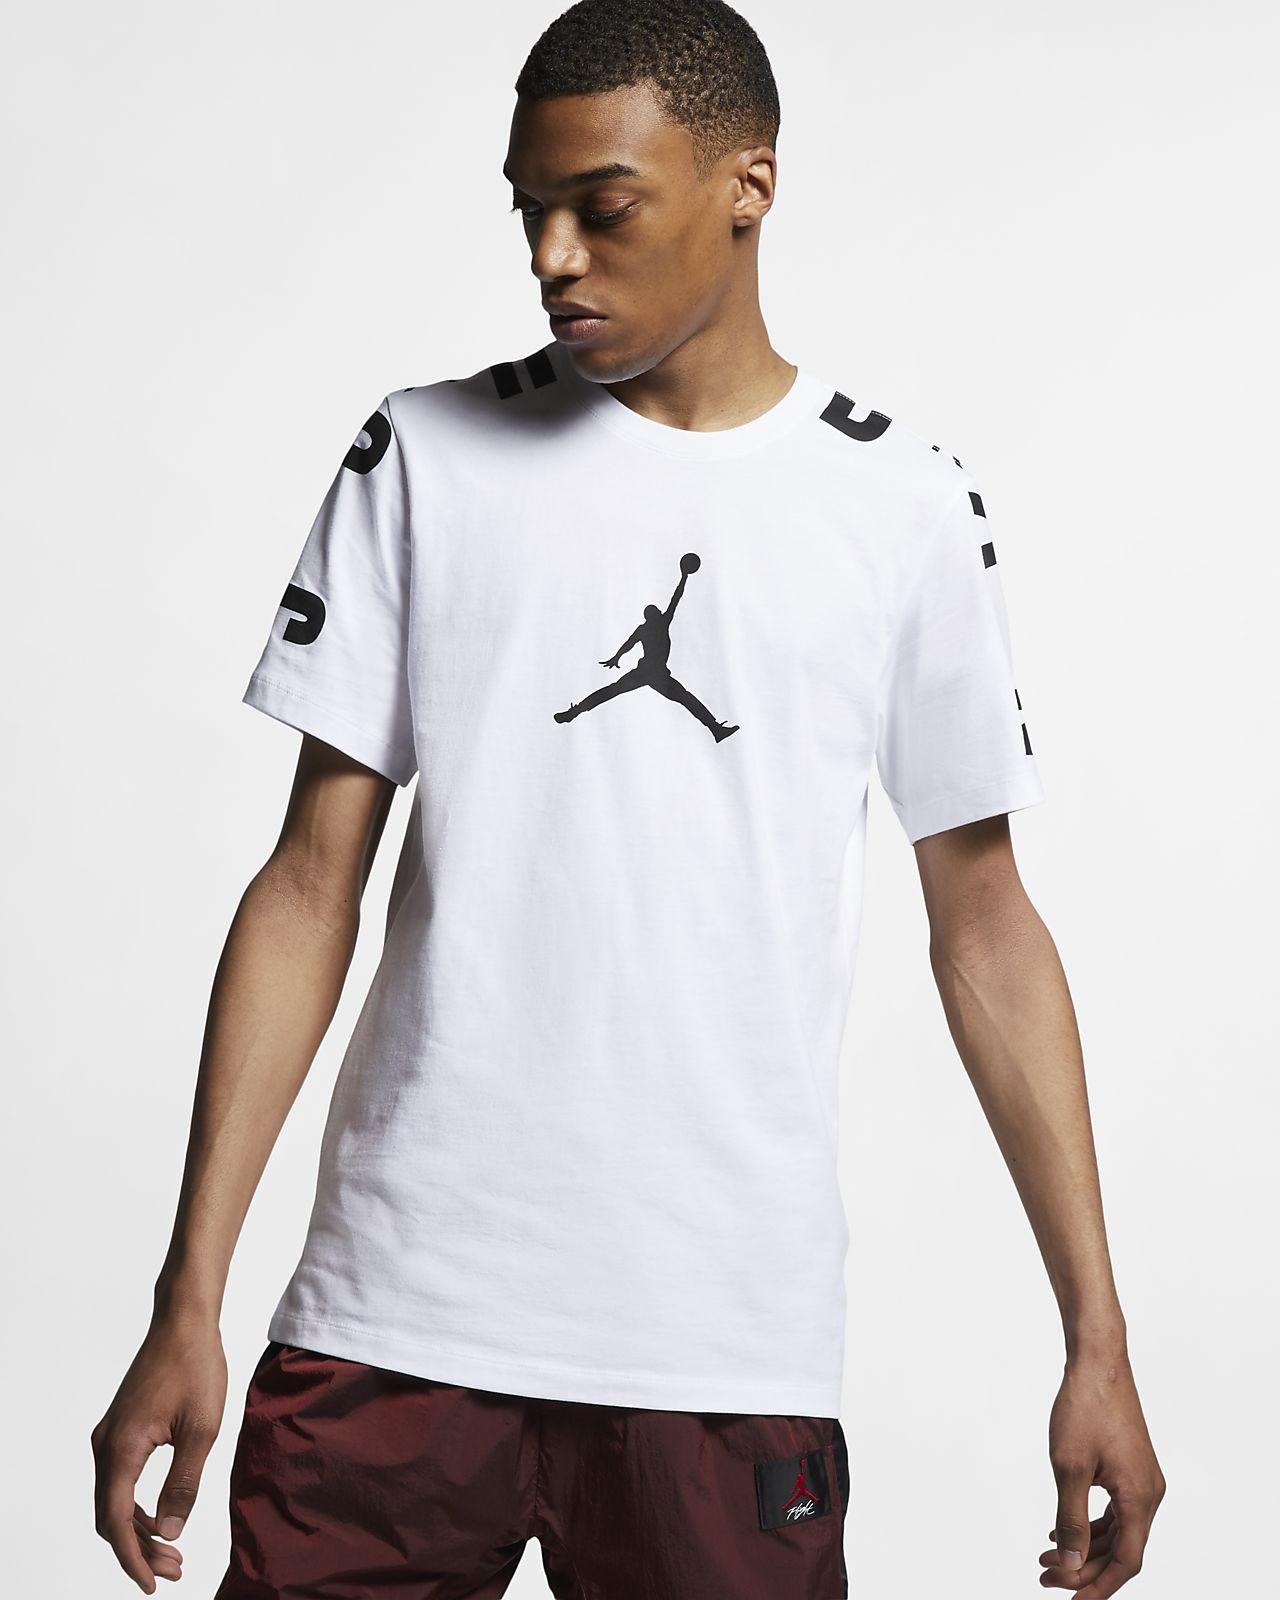 Tee-shirt Jordan Stretch 23 pour Homme